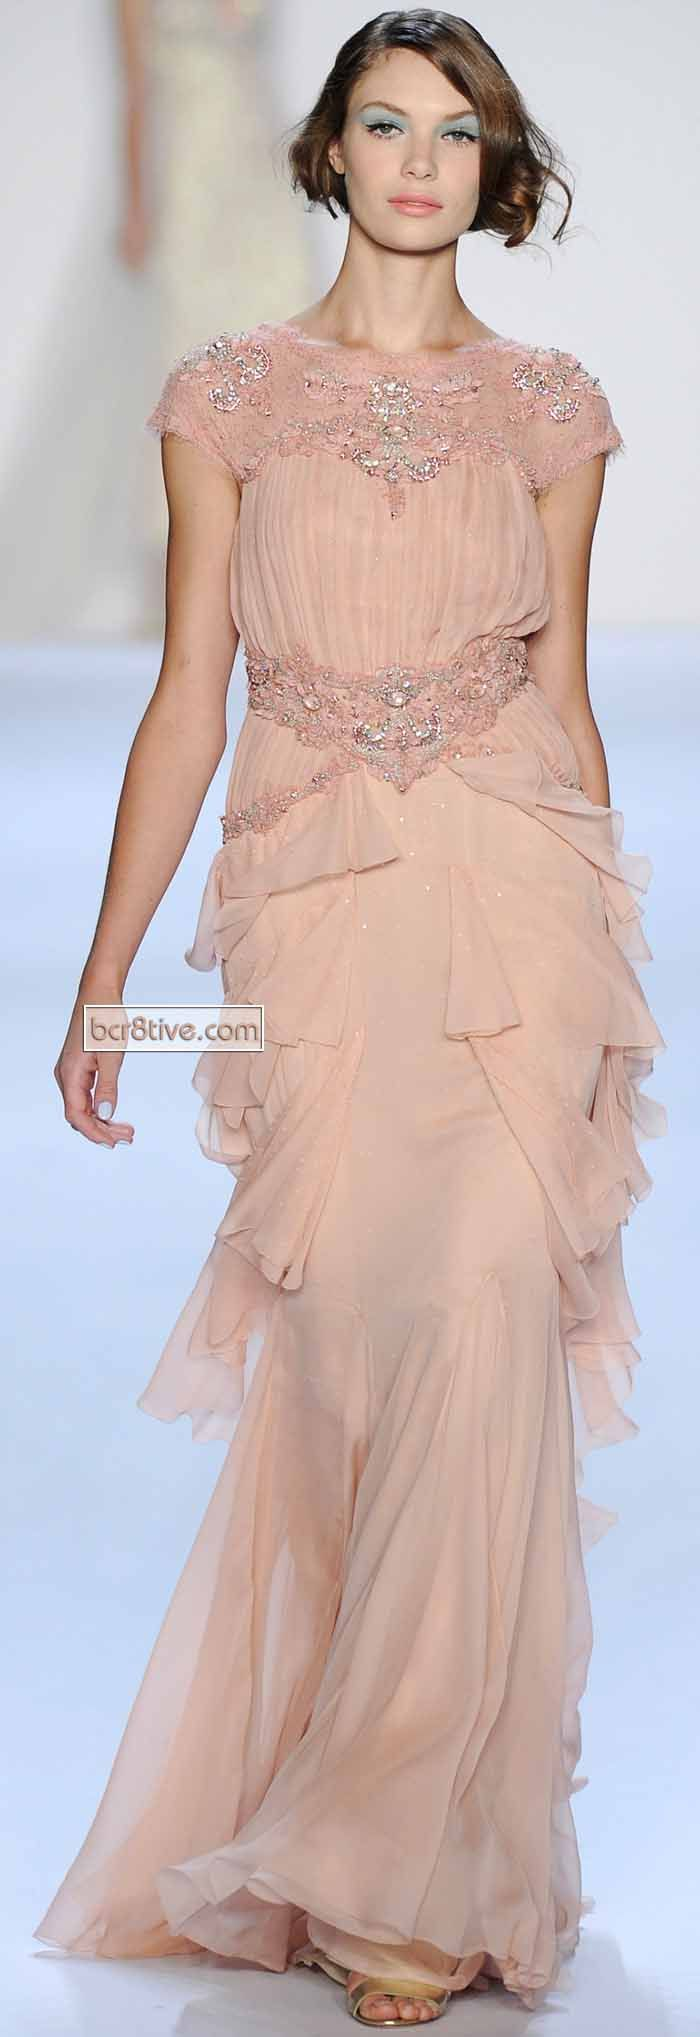 49 best BADGLEY MISCHKA Haute Couture images on Pinterest | Badgley ...